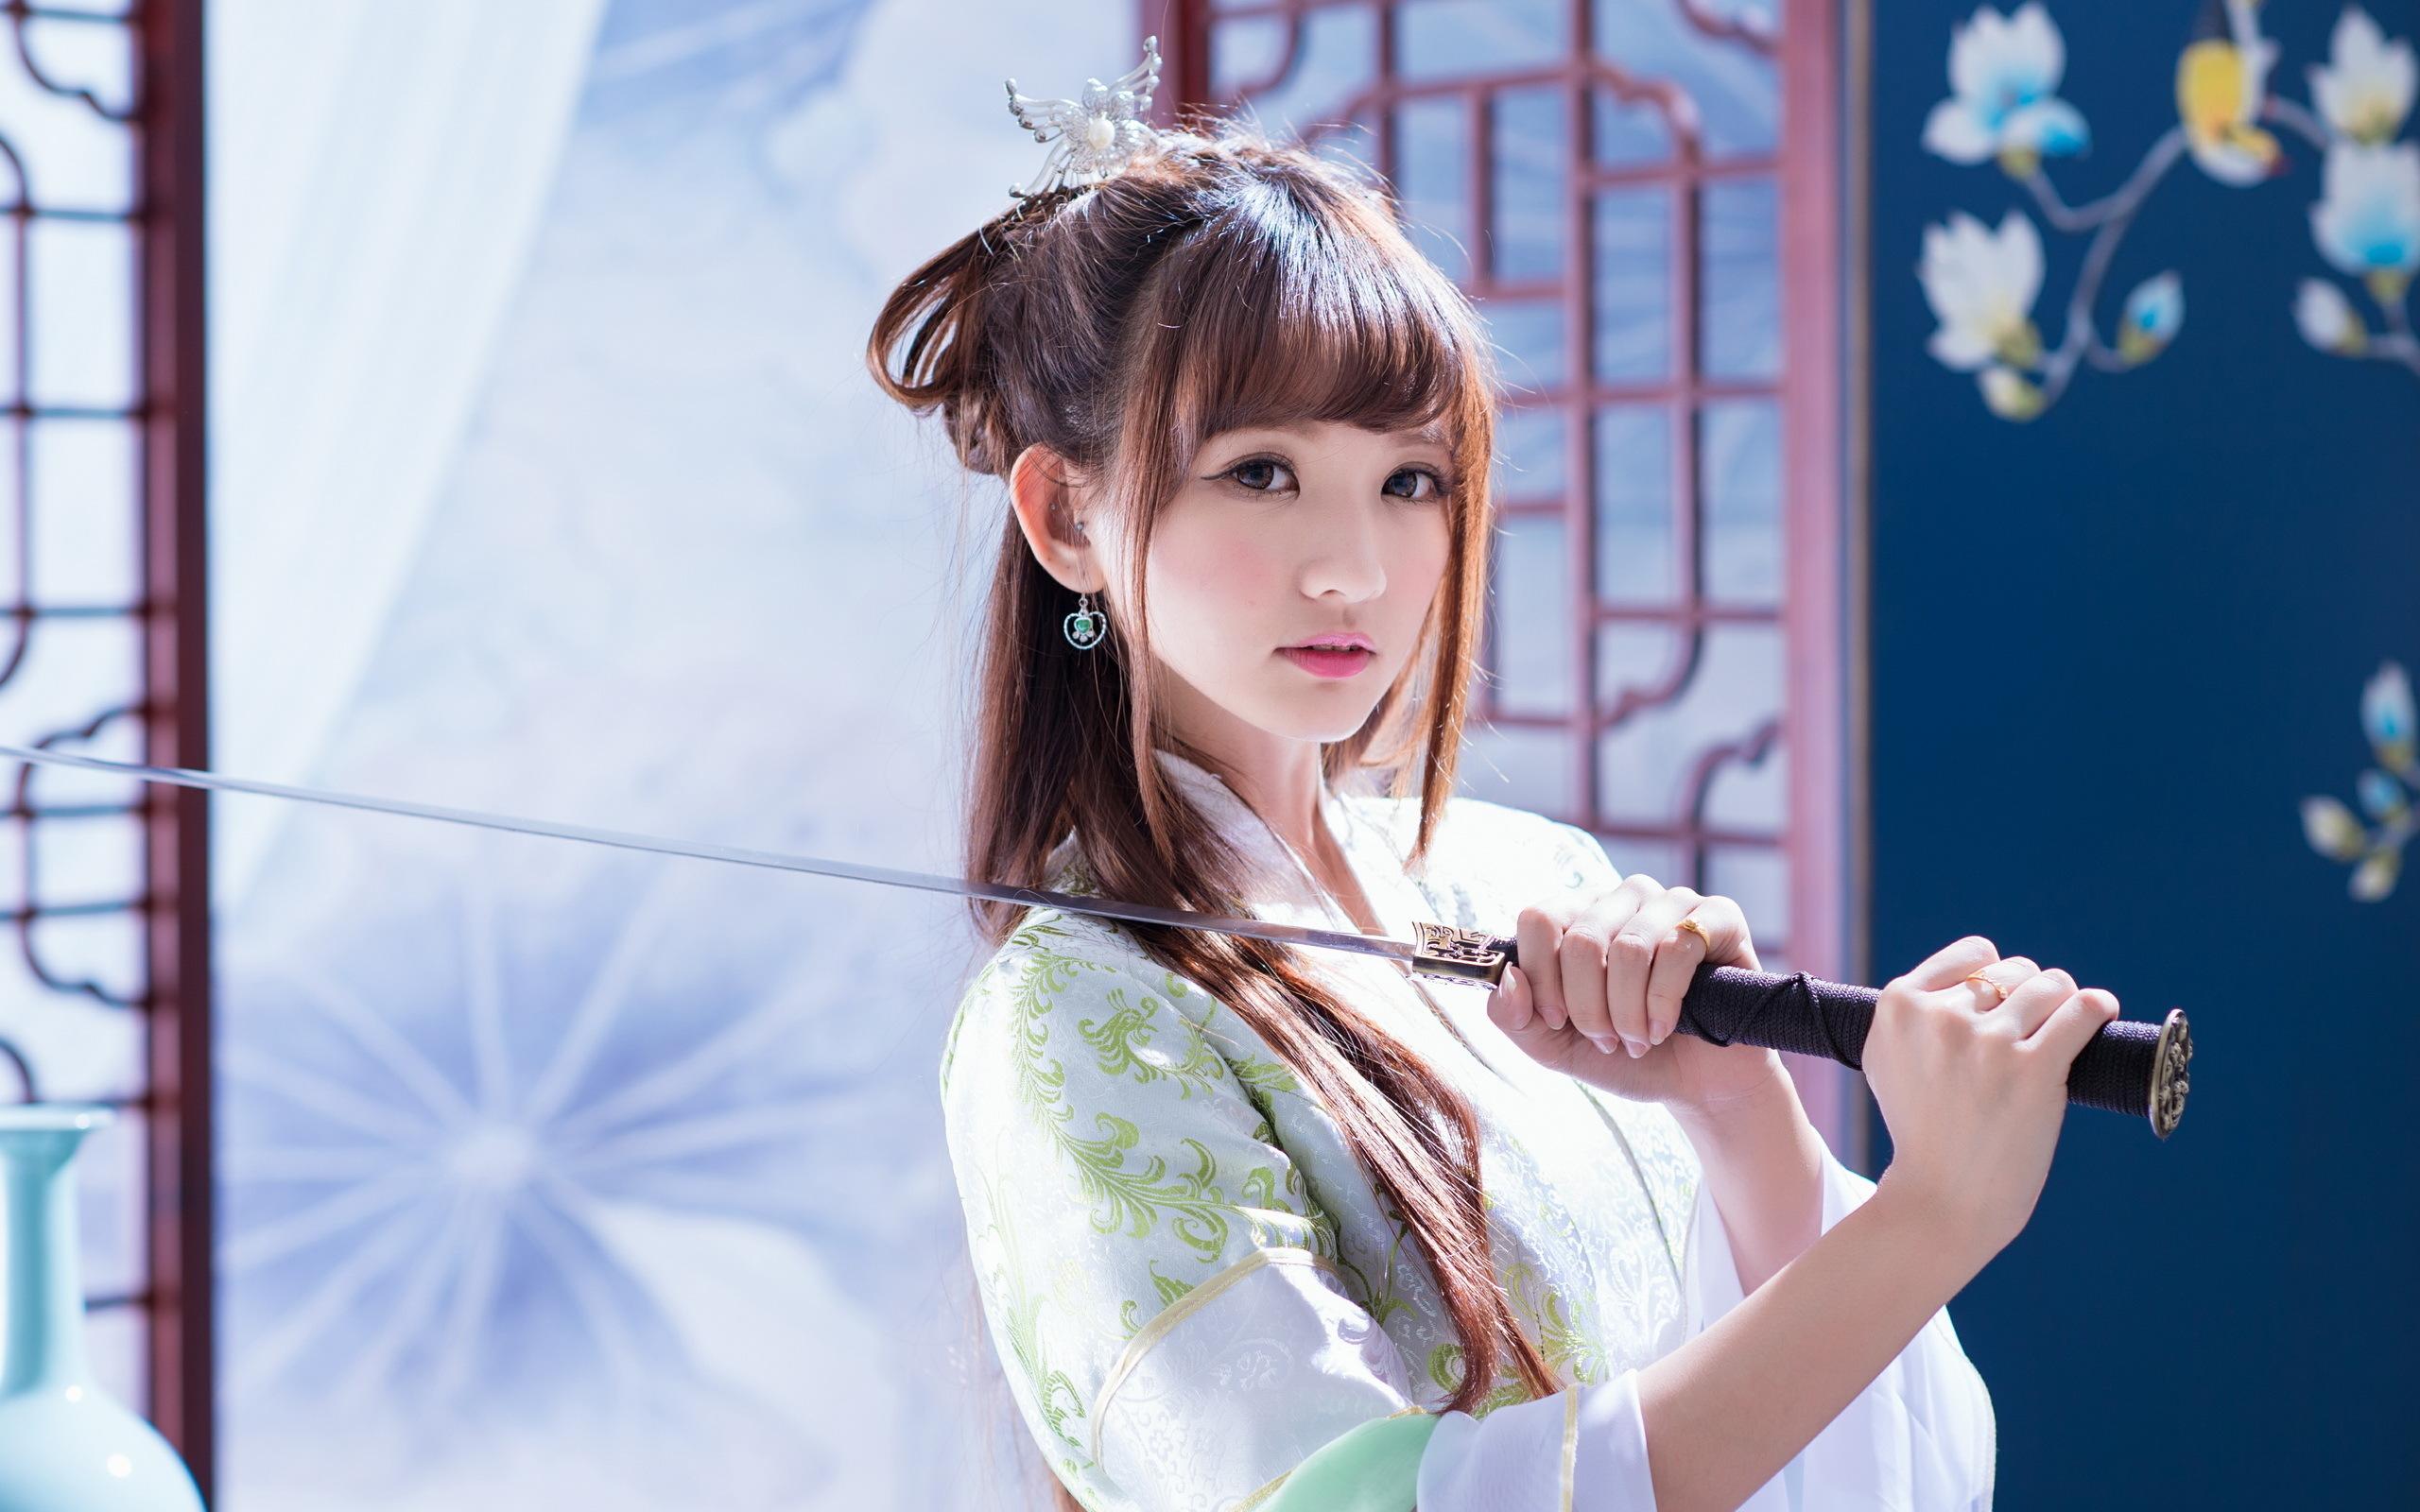 Geisha holding a sword wallpaper 34278 2560x1600